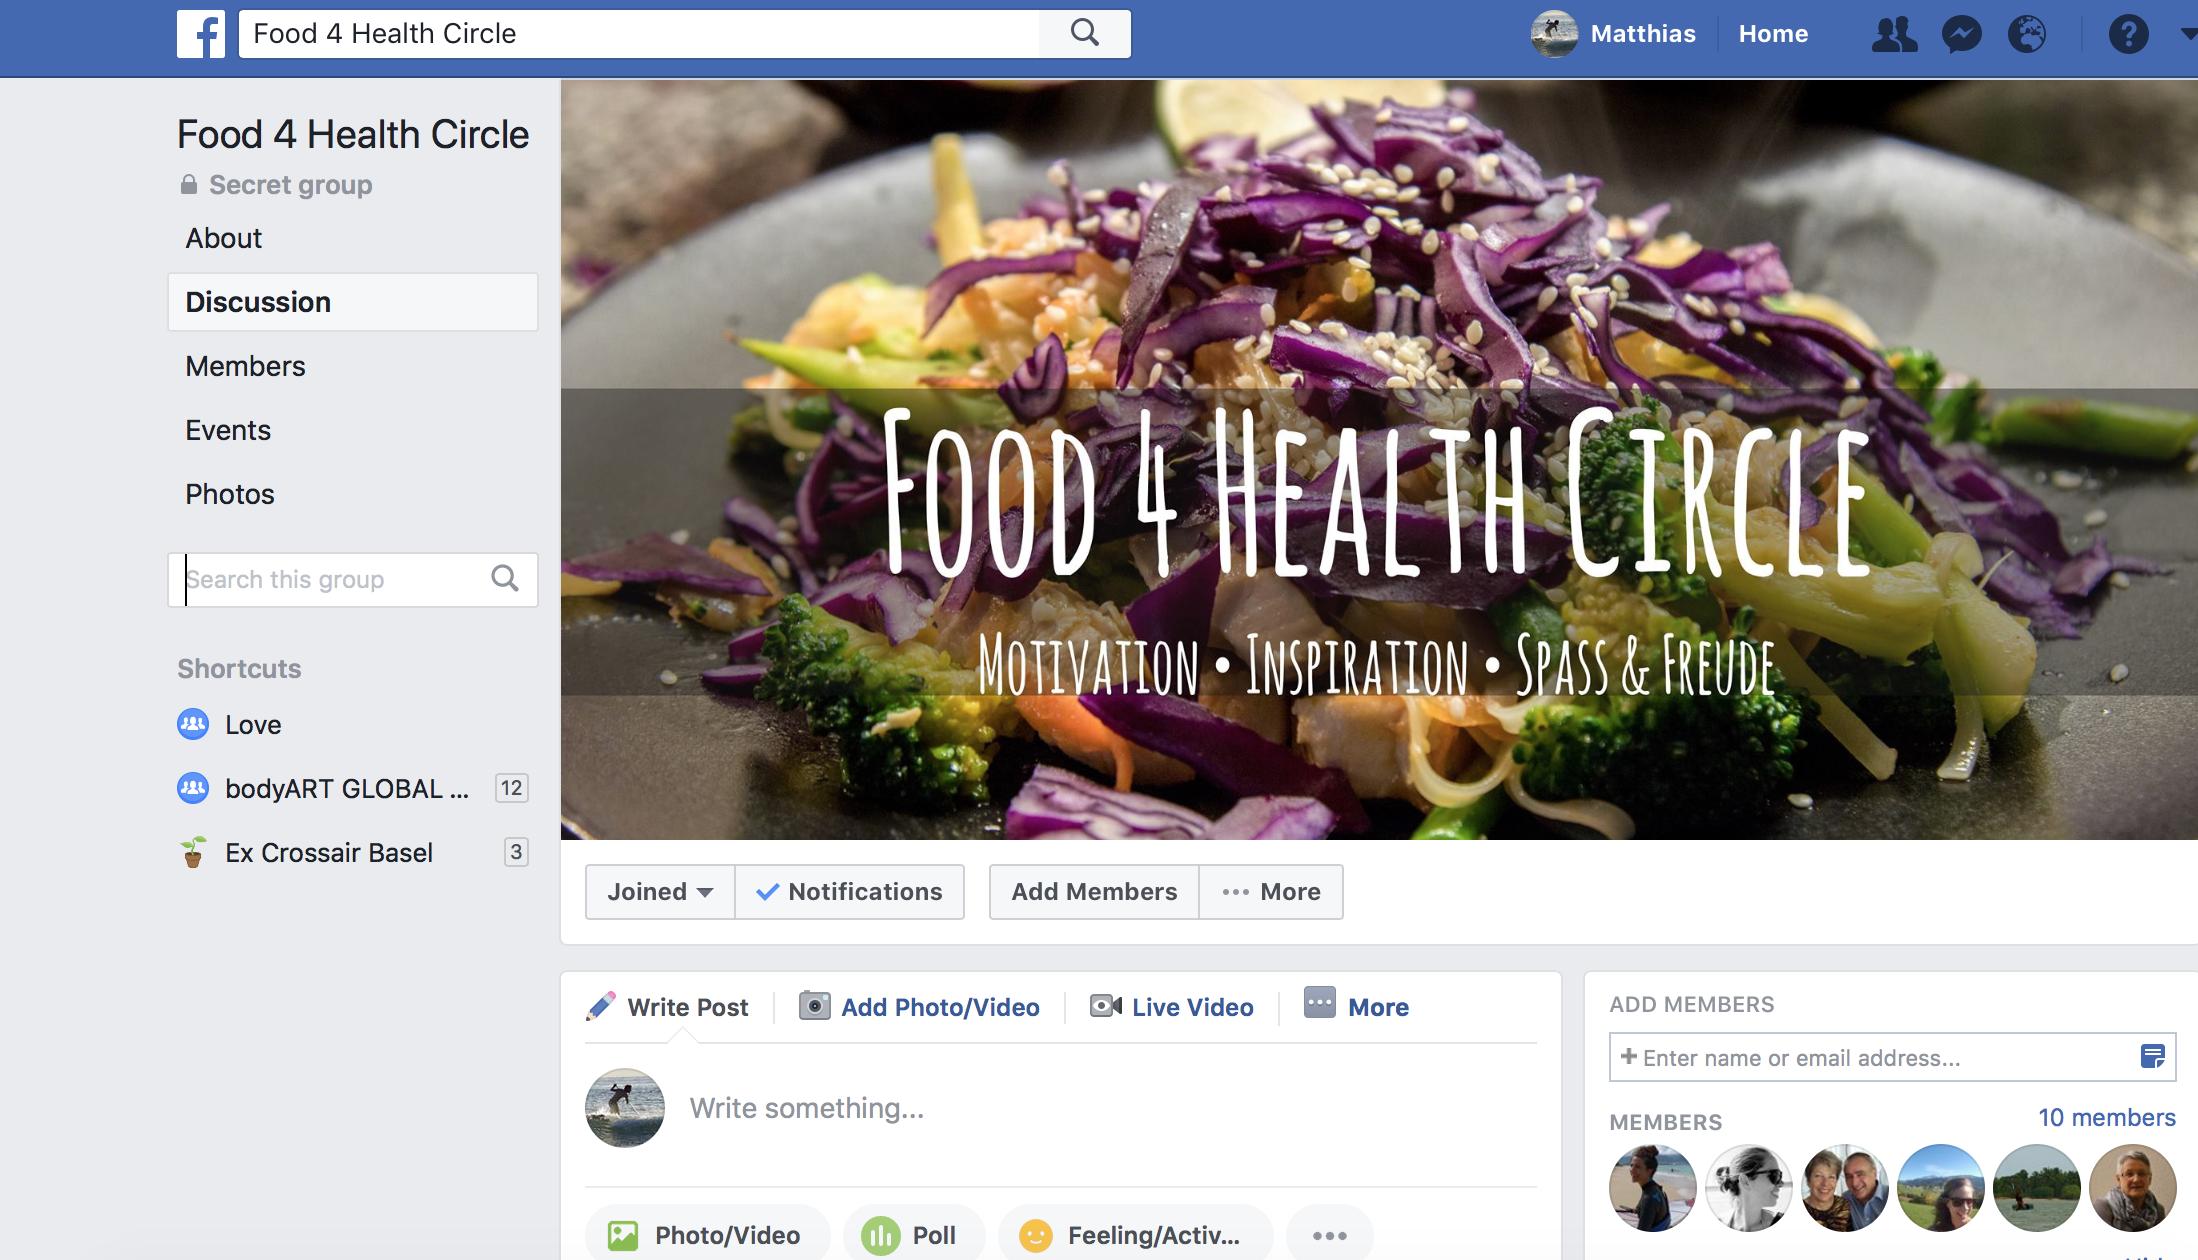 Food 4 Health Circle Facebook